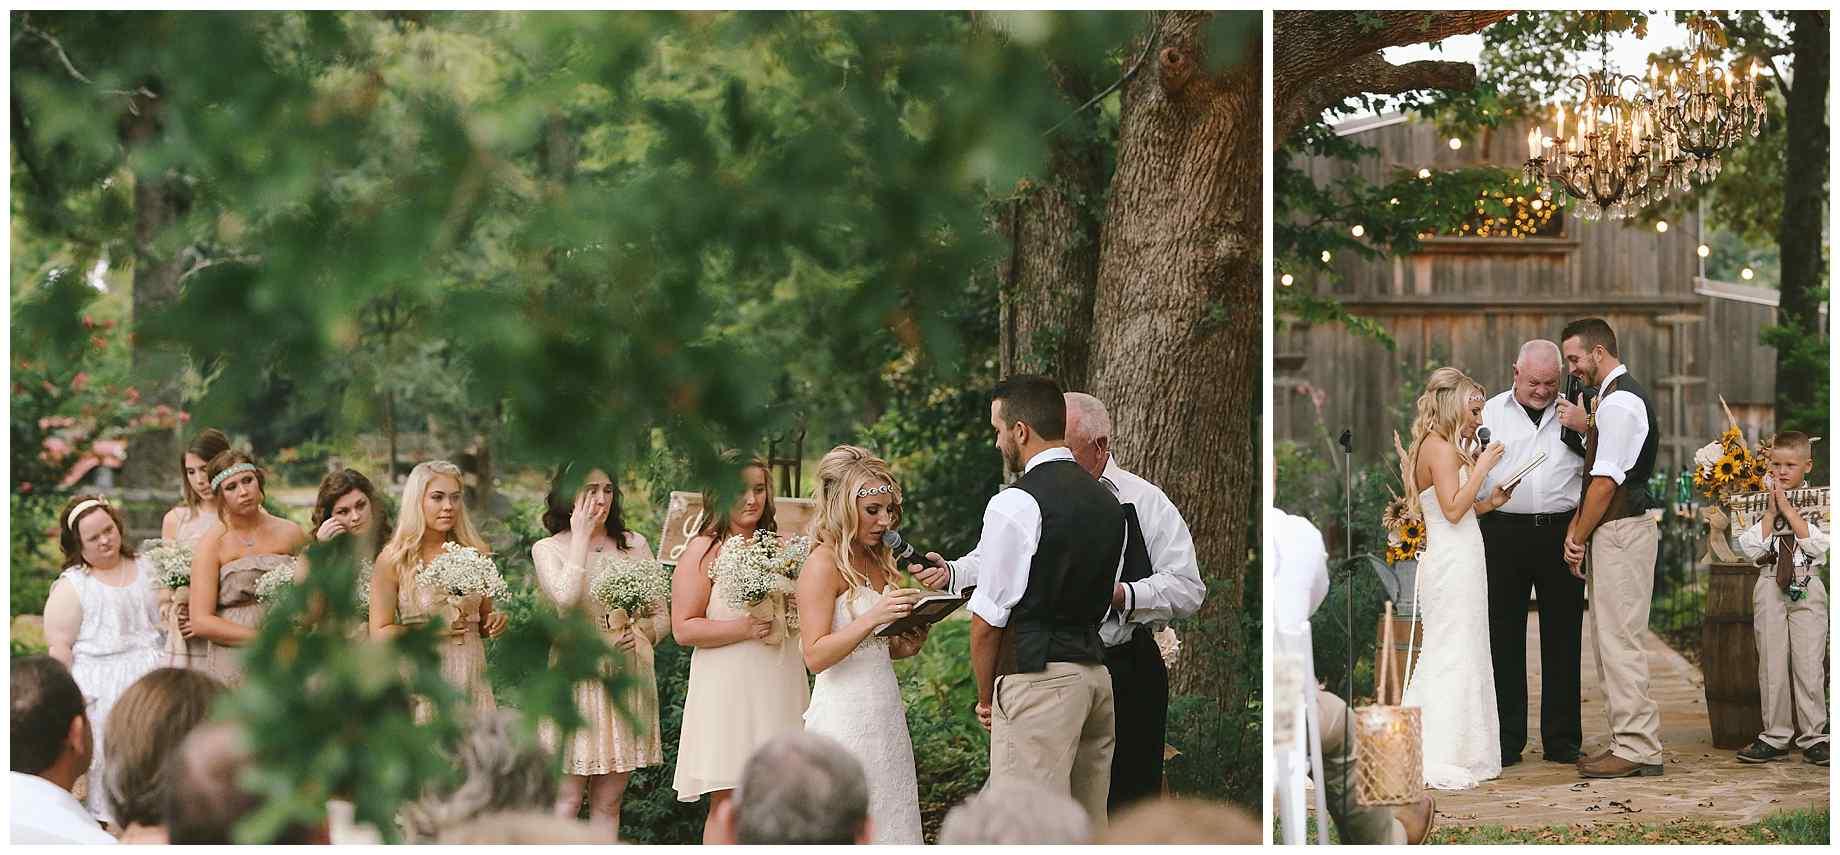 stone-oak-ranch-outdoor-wedding-018